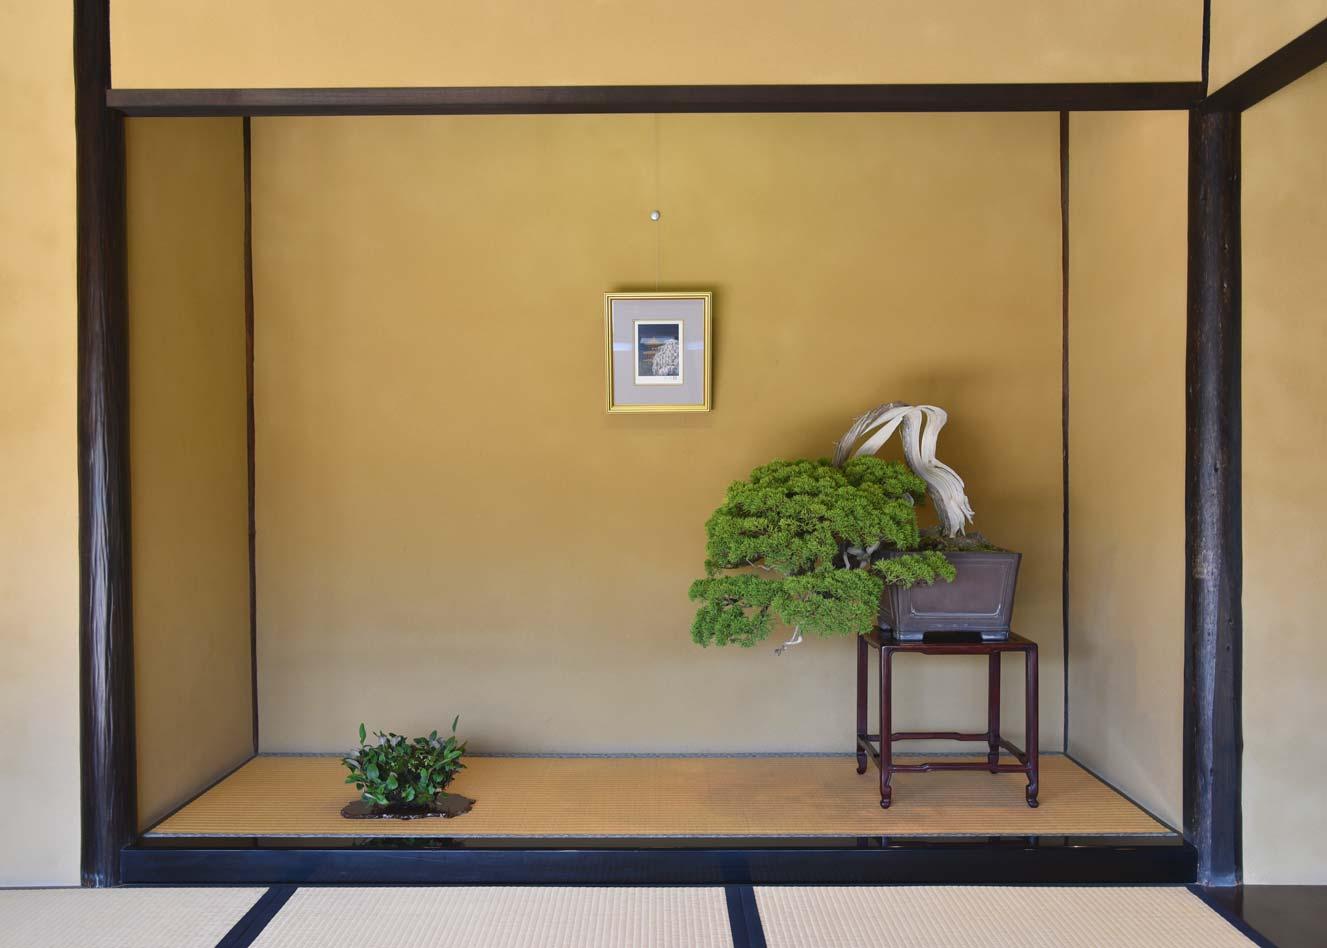 200 year old Juniper Bonsai at the National Bonsai Garden, Showa Memorial Park, Tokyo